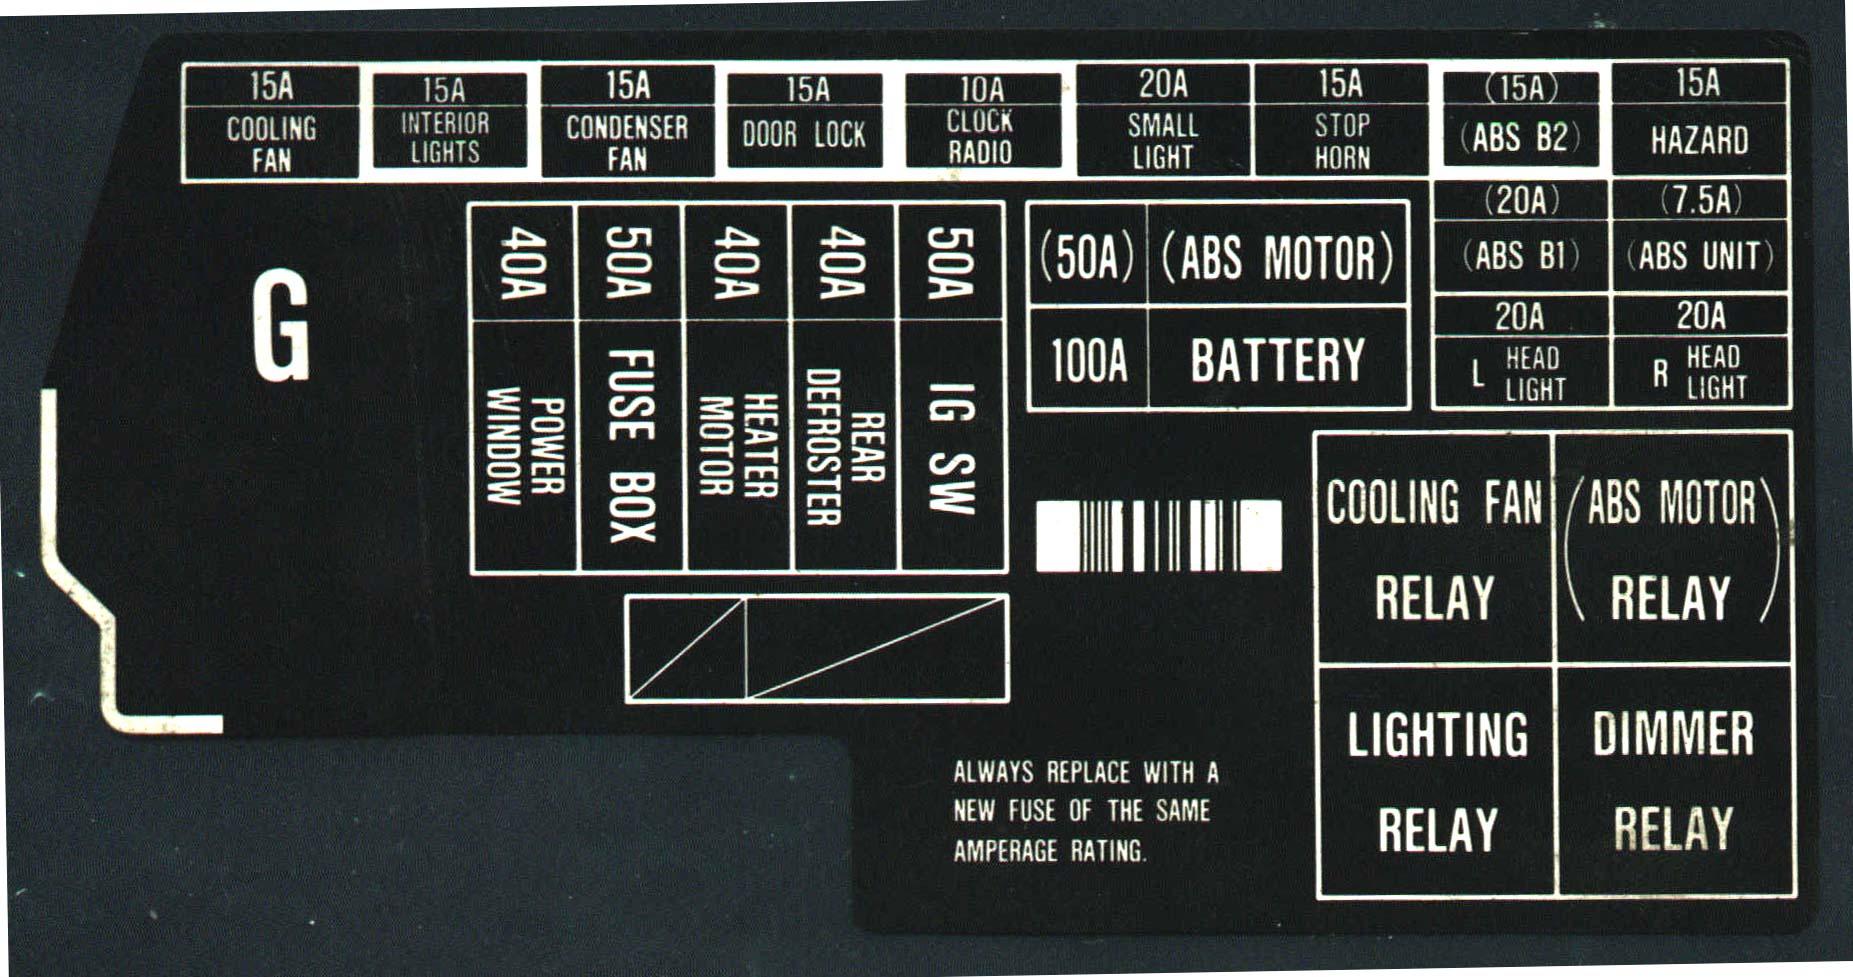 2001 honda prelude wiring diagram avital 3100l